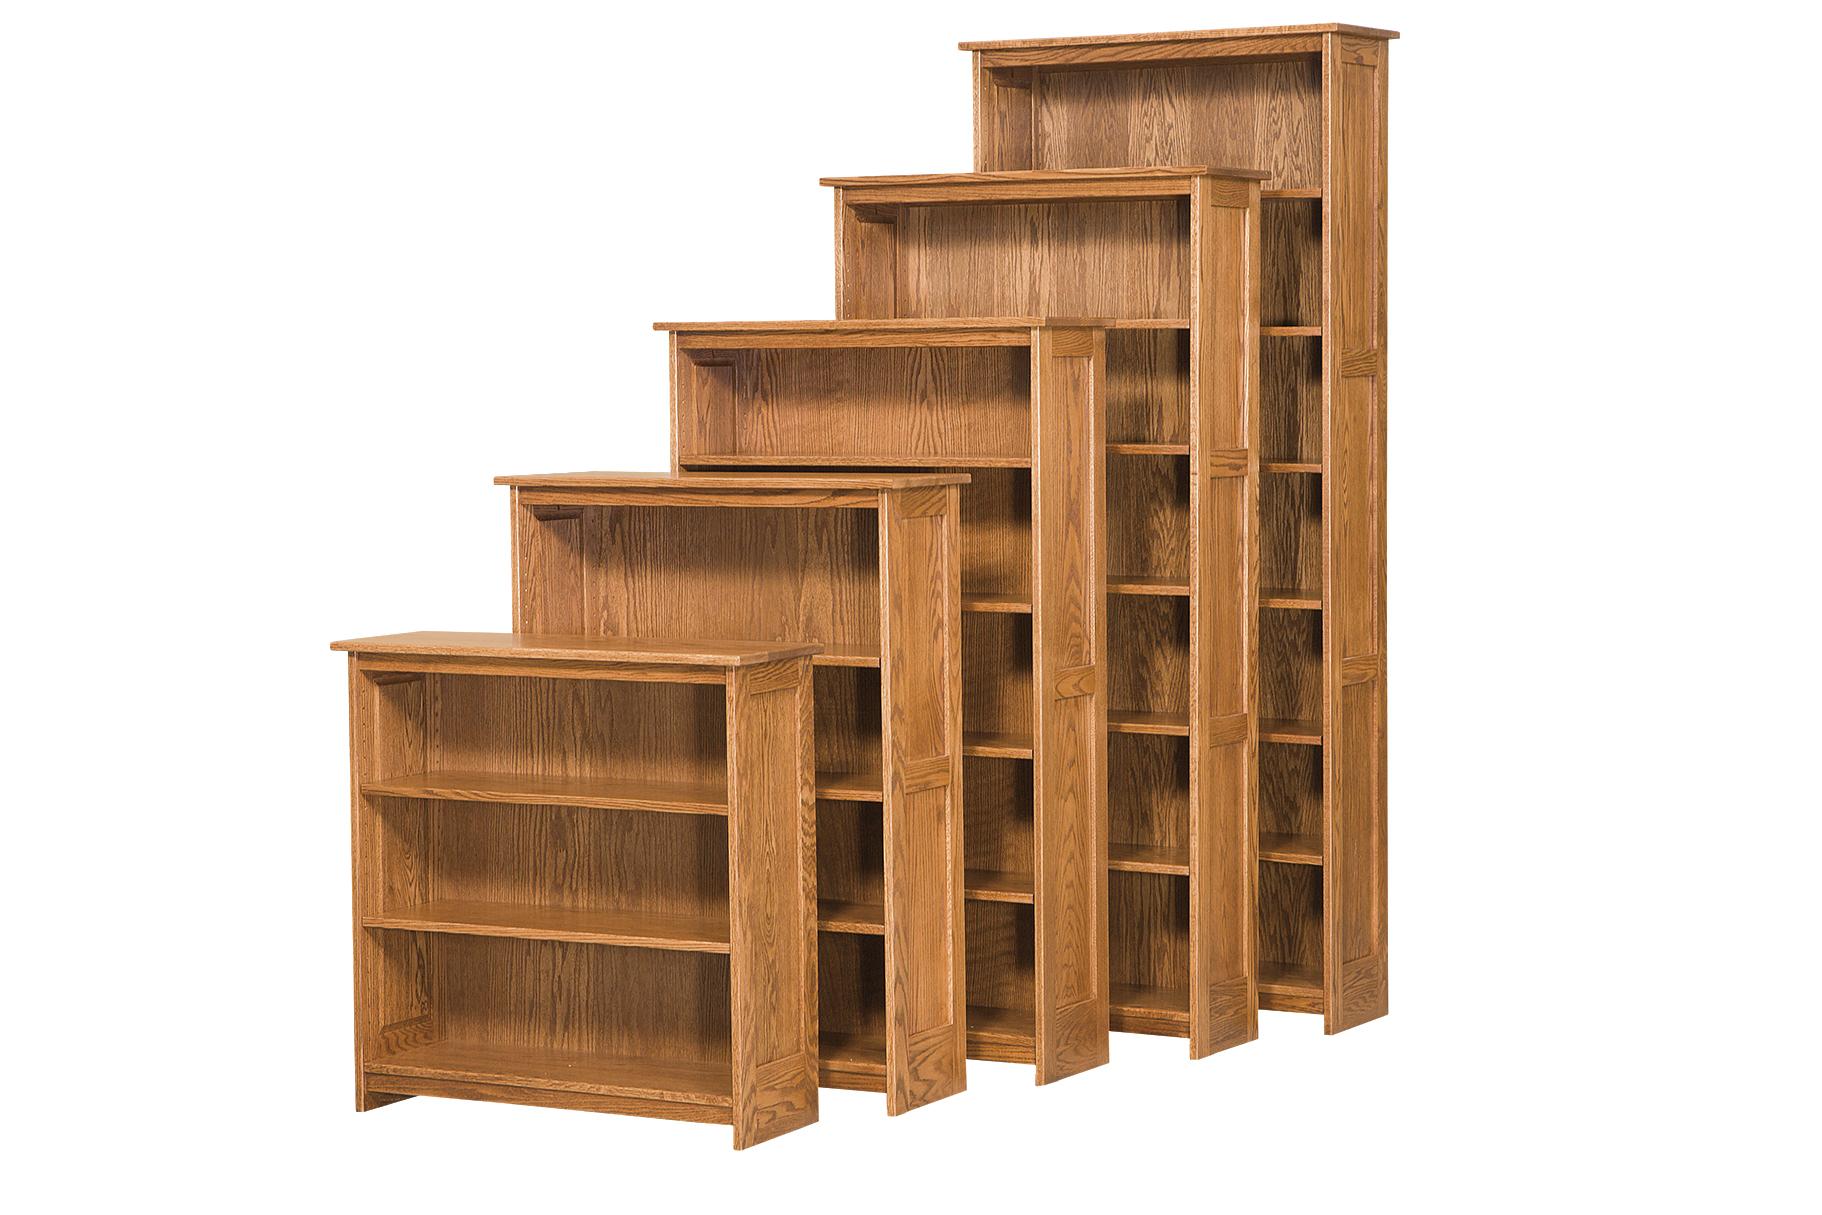 36W Mission Flat Panel Bookcase  Amish Furniture Connections  Amish Furniture Connections